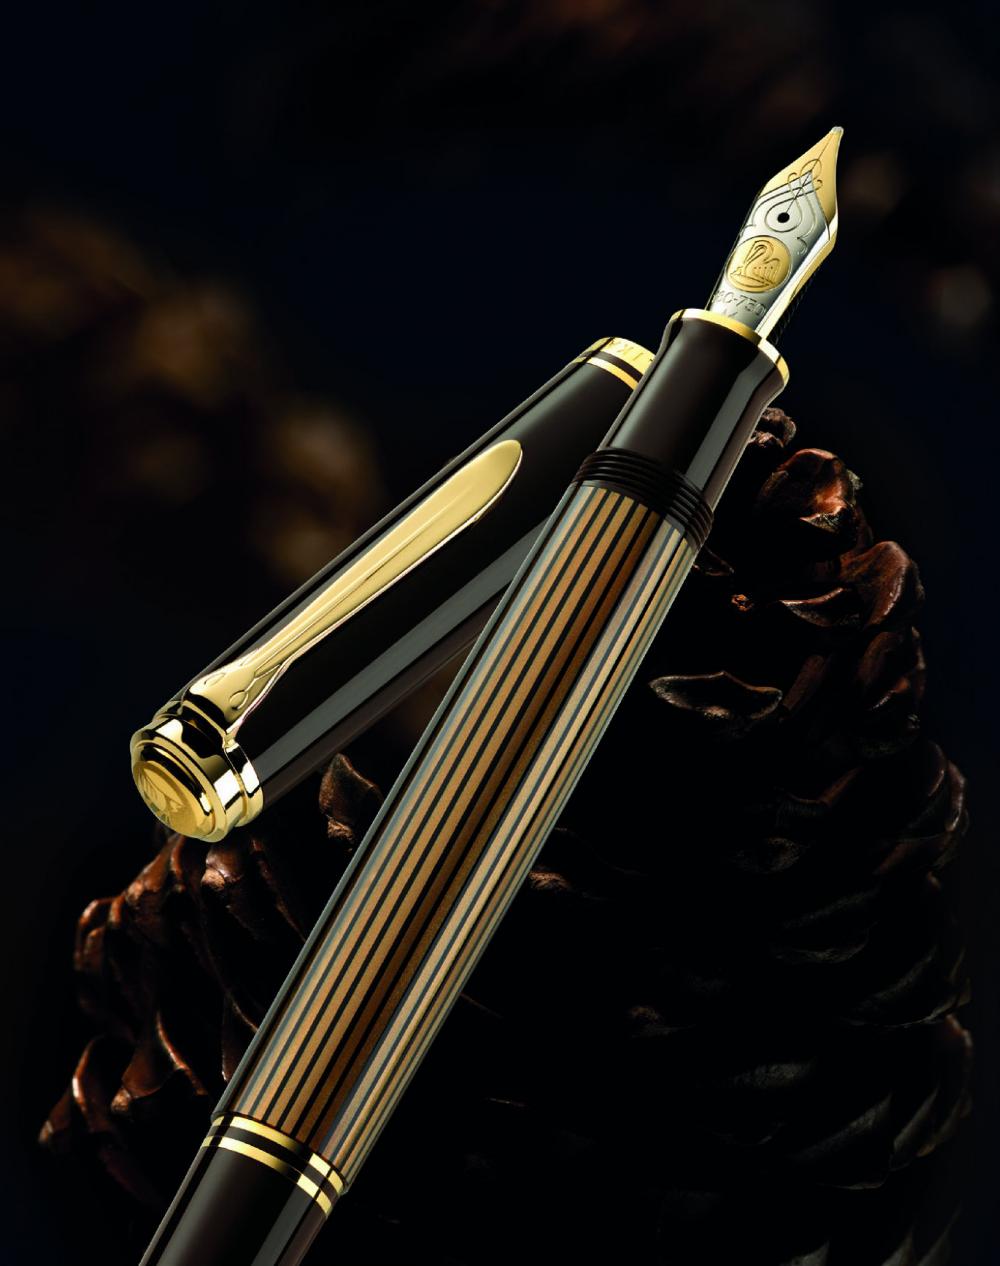 Pin By Habakuka Humorum On Pen Fountain Pen Pen Fountain Pen Ink